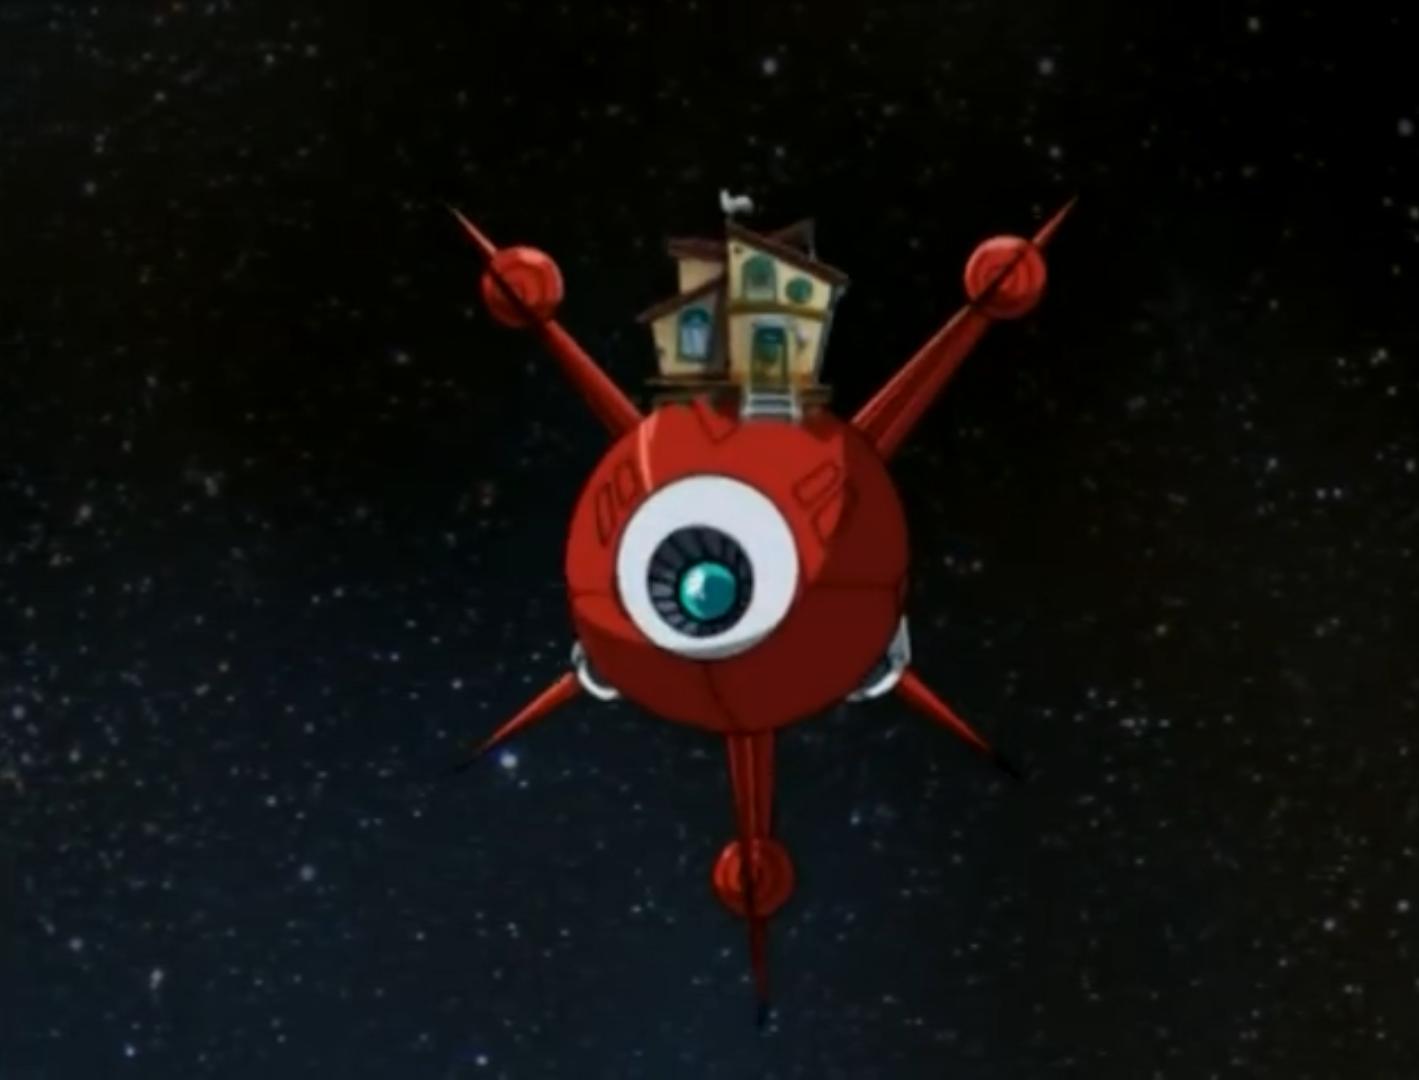 Chaotix's Spaceship